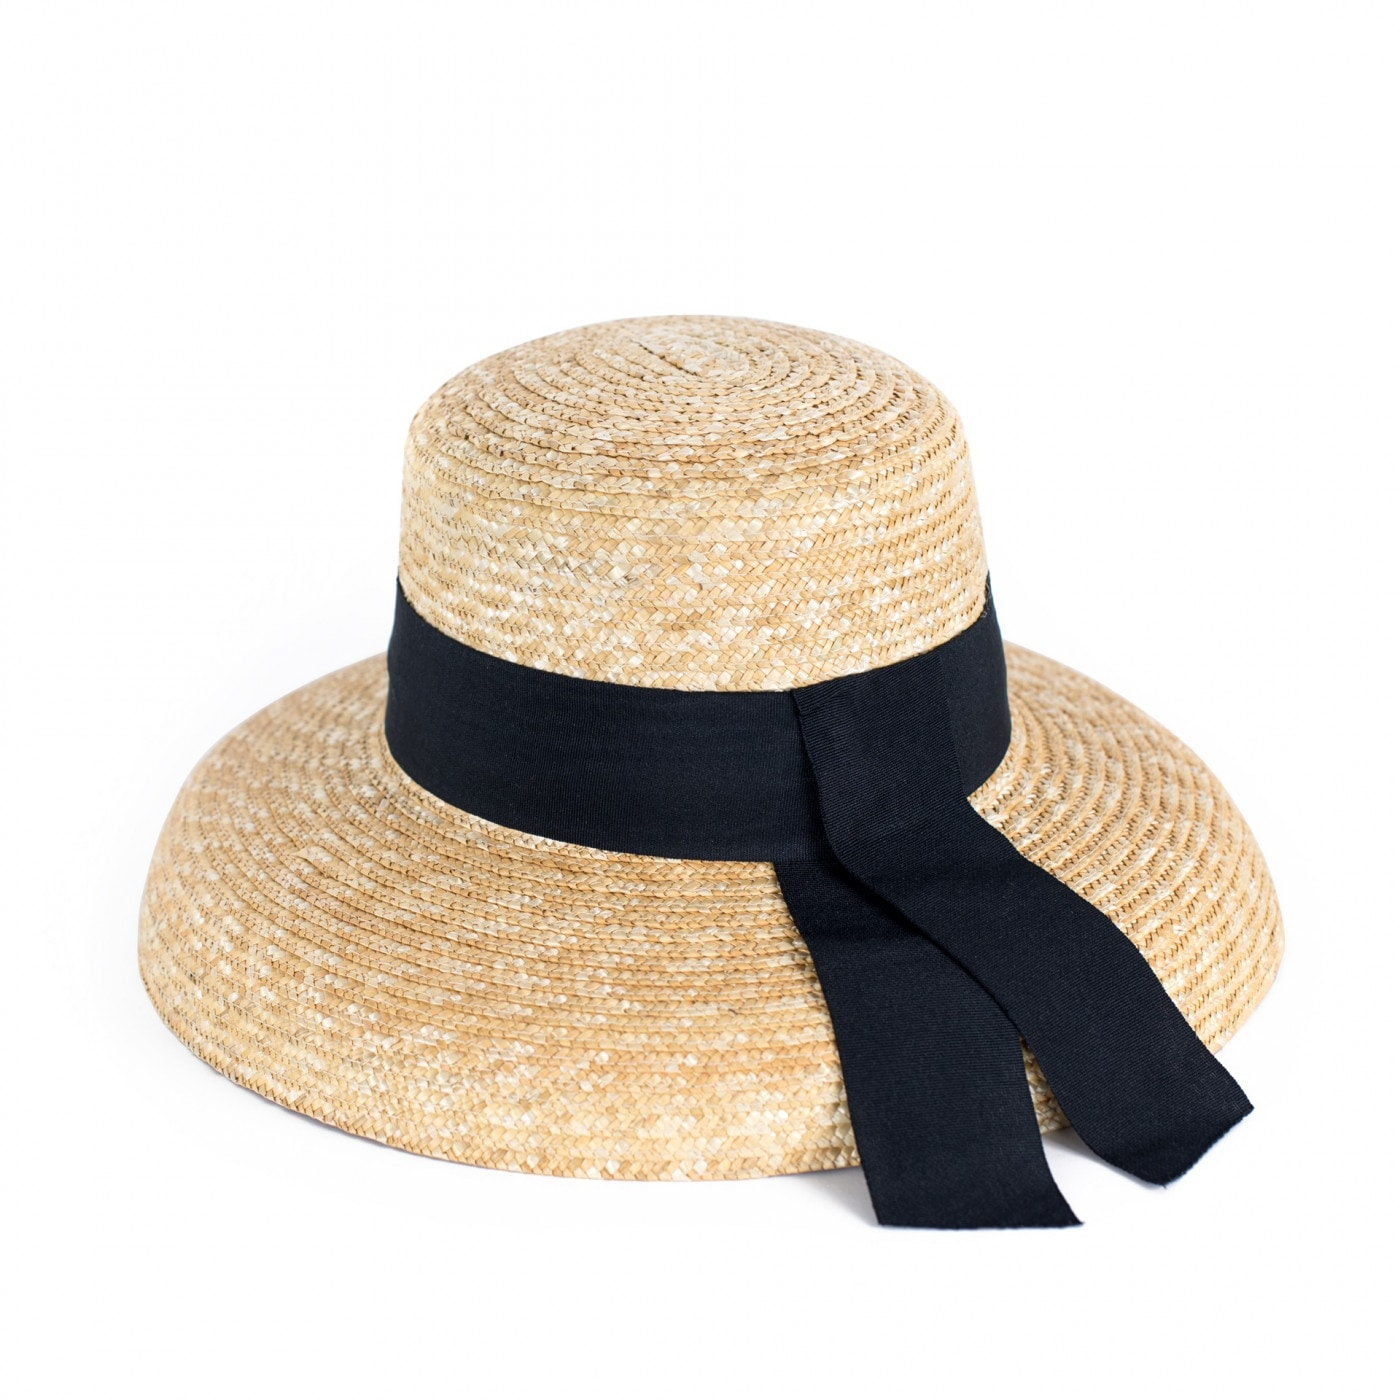 Art Of Polo Woman's Hat cz19118